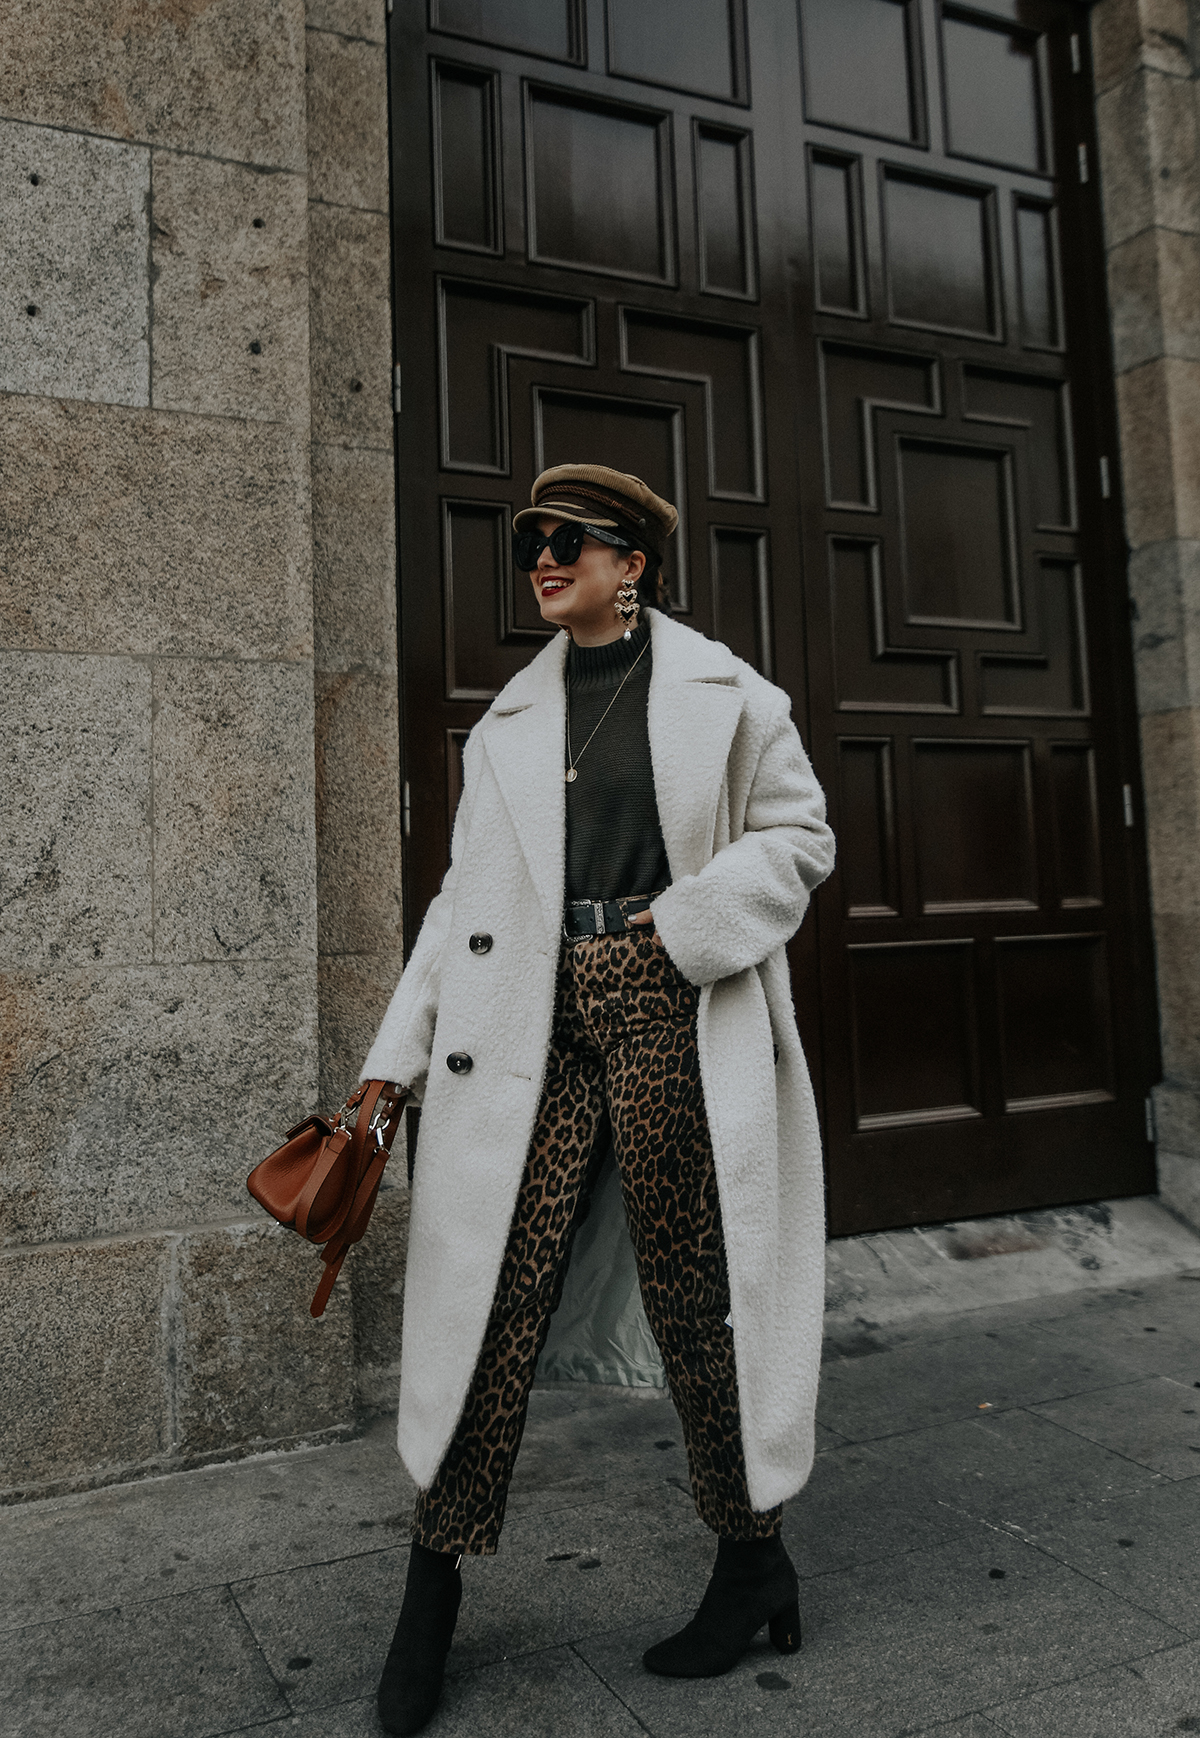 pantalones-leopardo-look-botines-ysl-streetstyle9